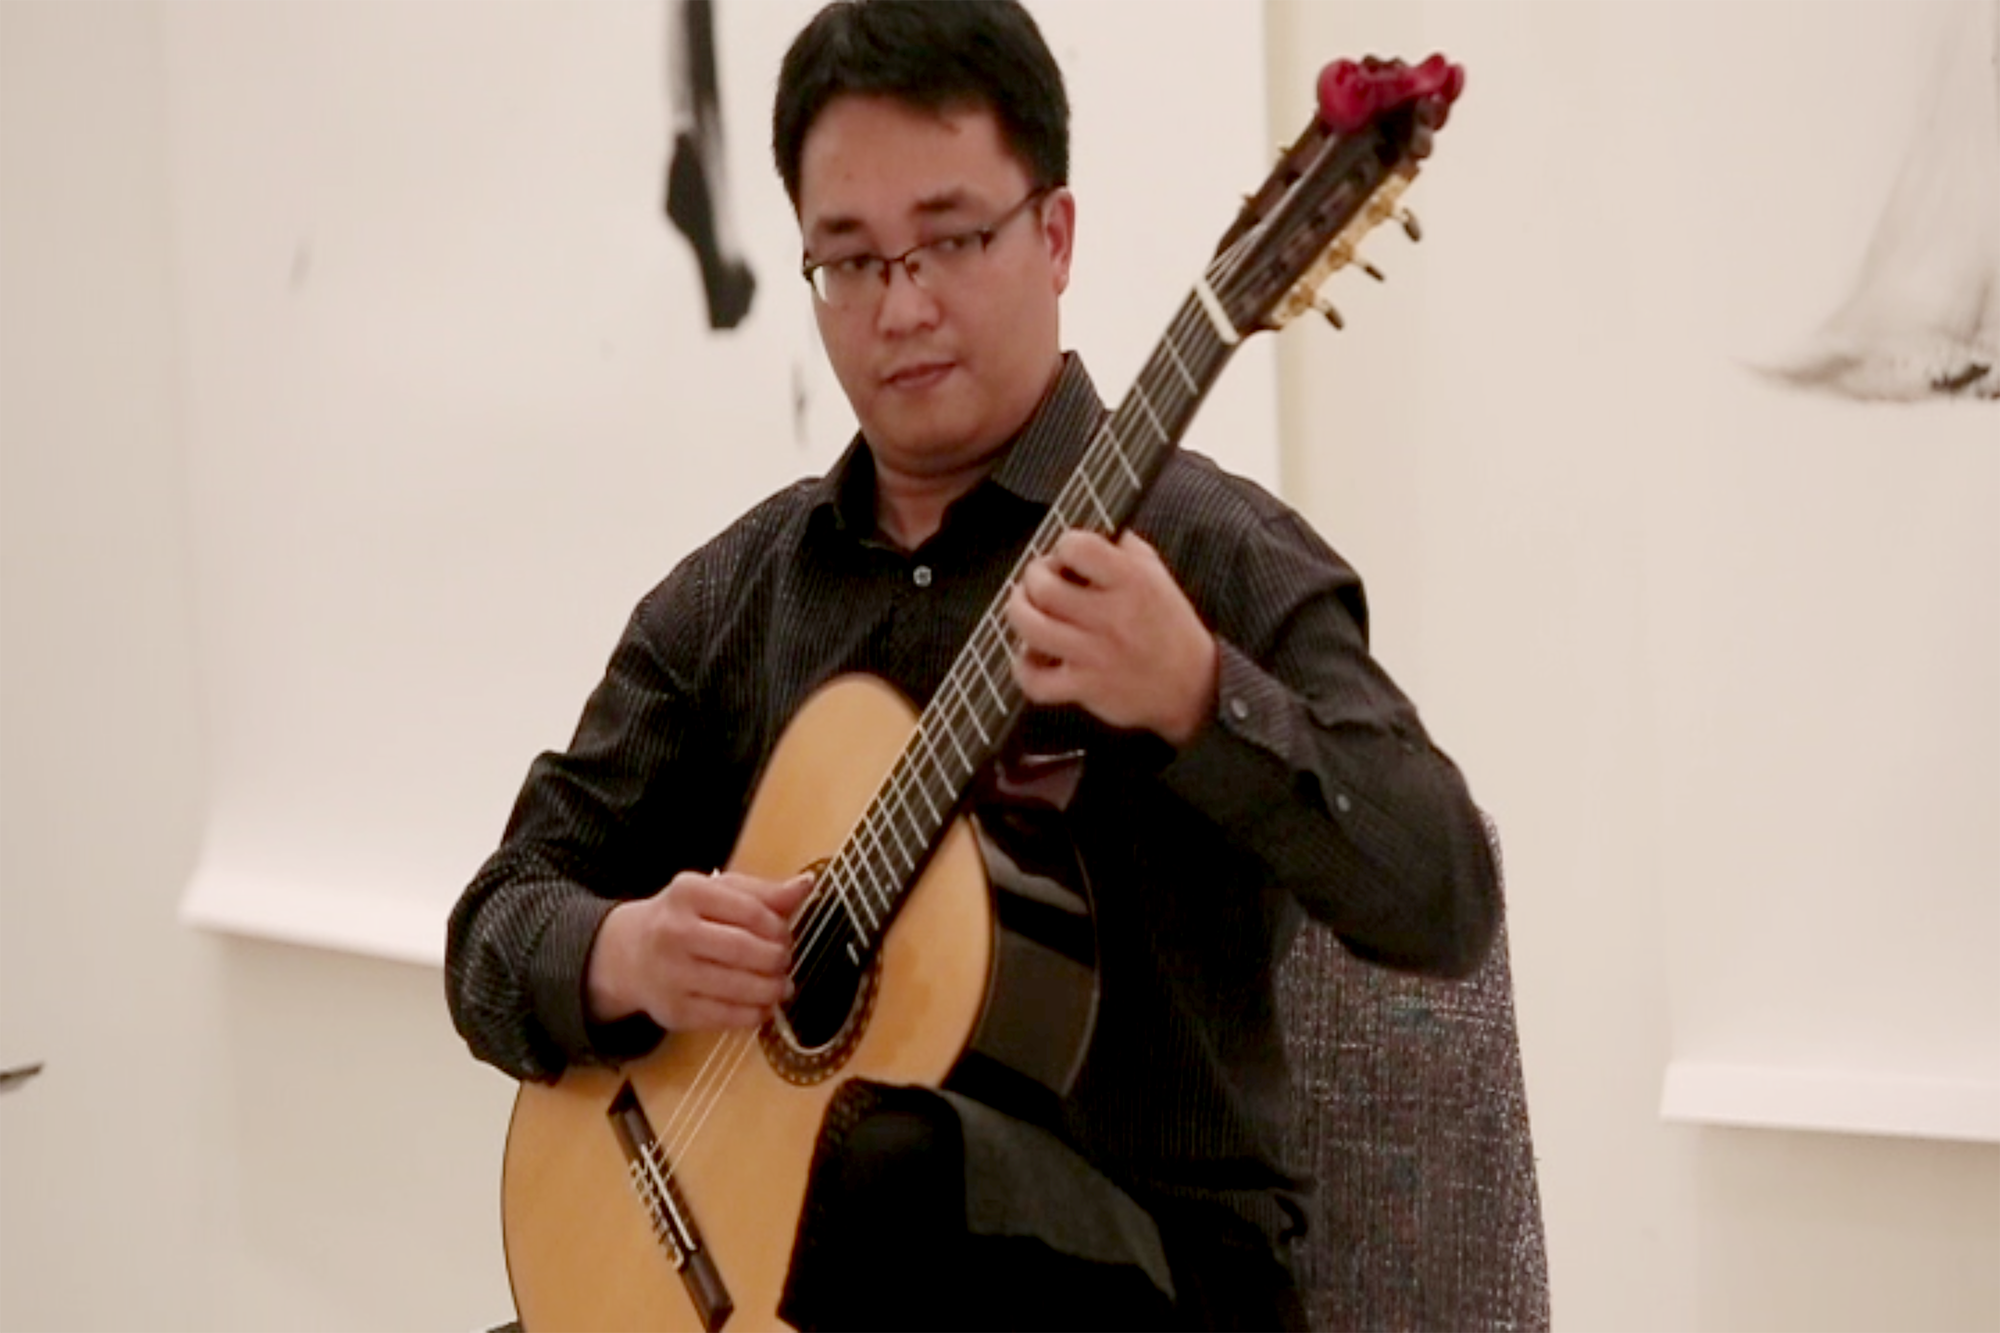 Performance by Manuel Cabrera II